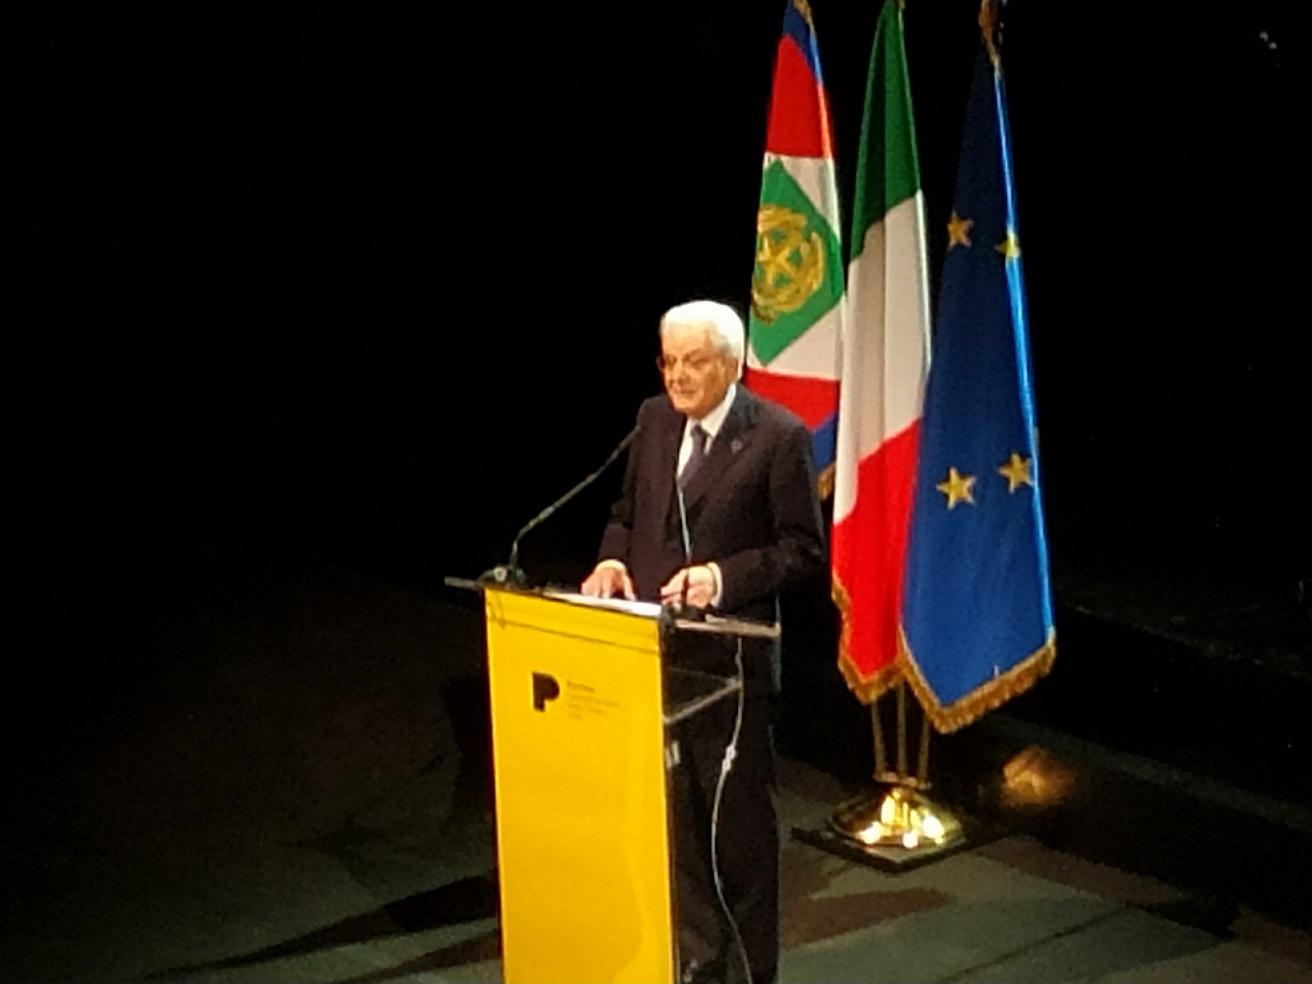 Parma 2020 Teatro Regio Presidente Mattarella 2